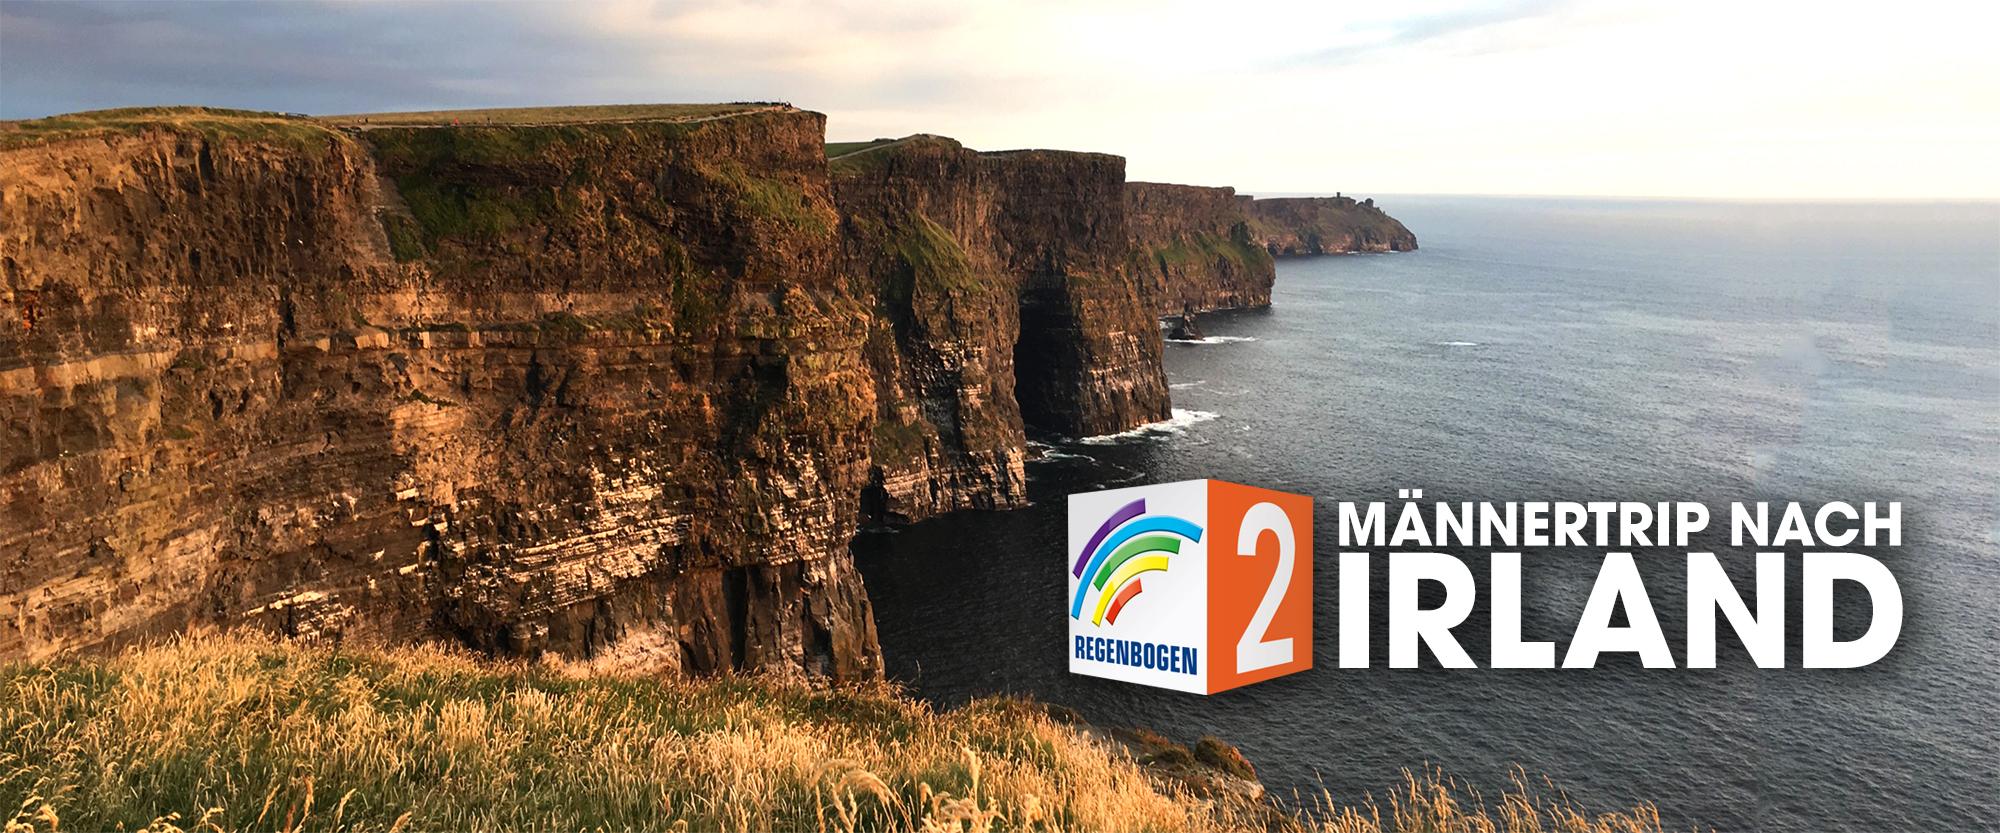 Irland-Titel.jpg